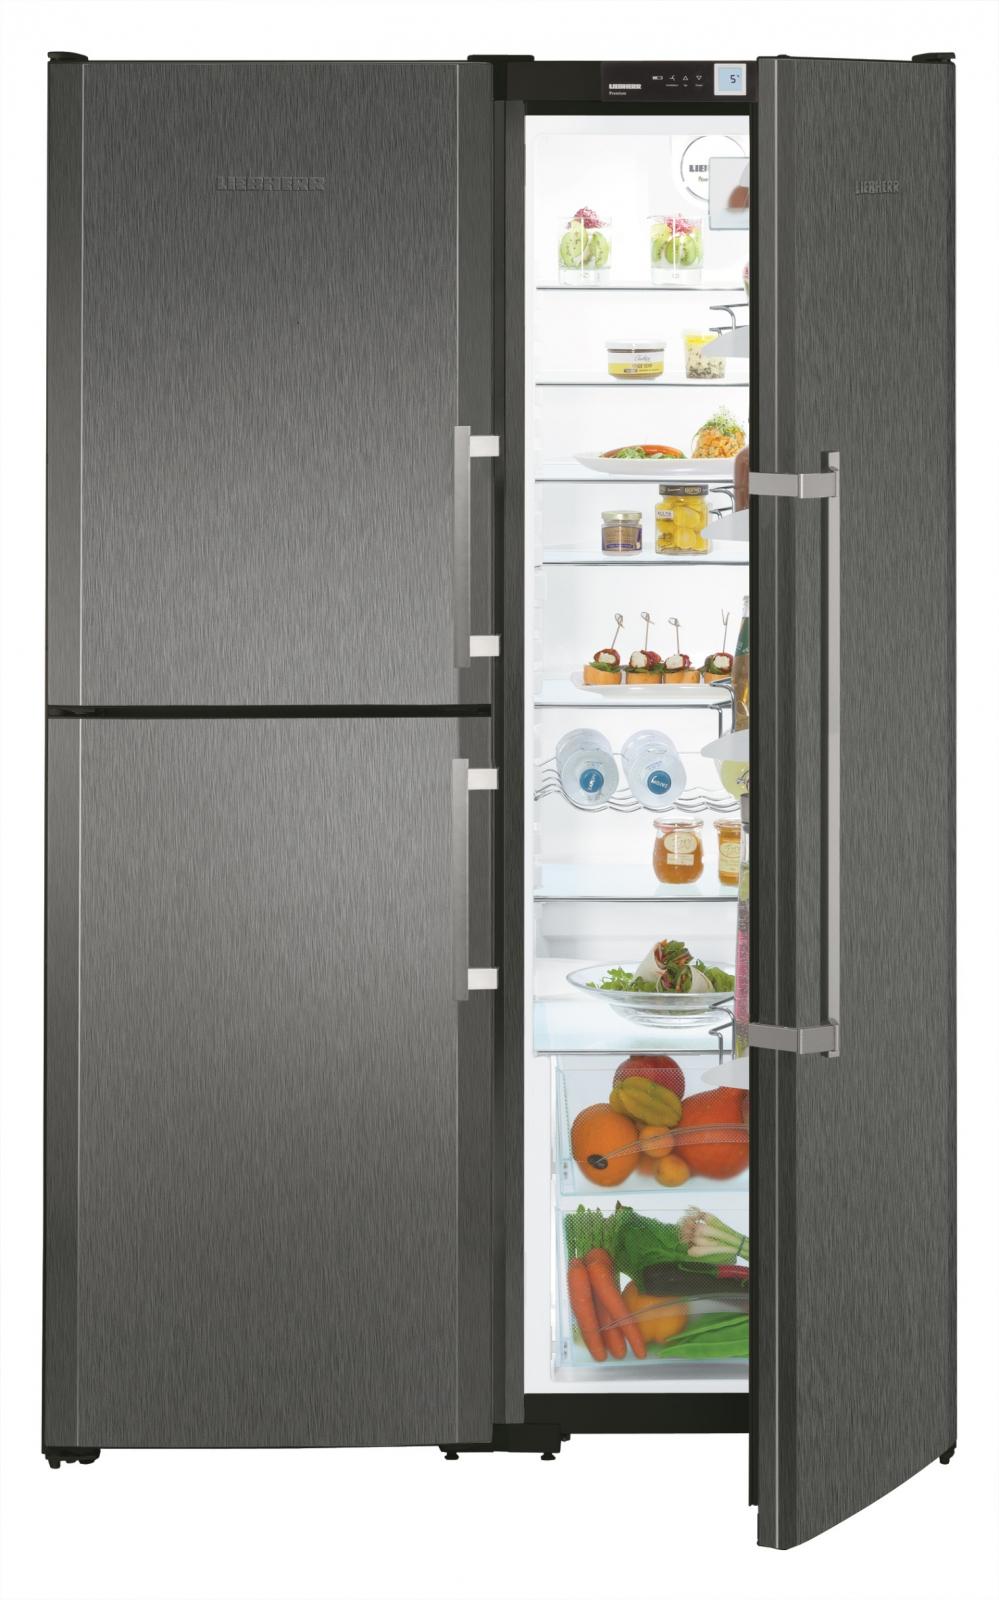 купить Side-by-Side холодильник Liebherr SBSbs 7353 Украина фото 3